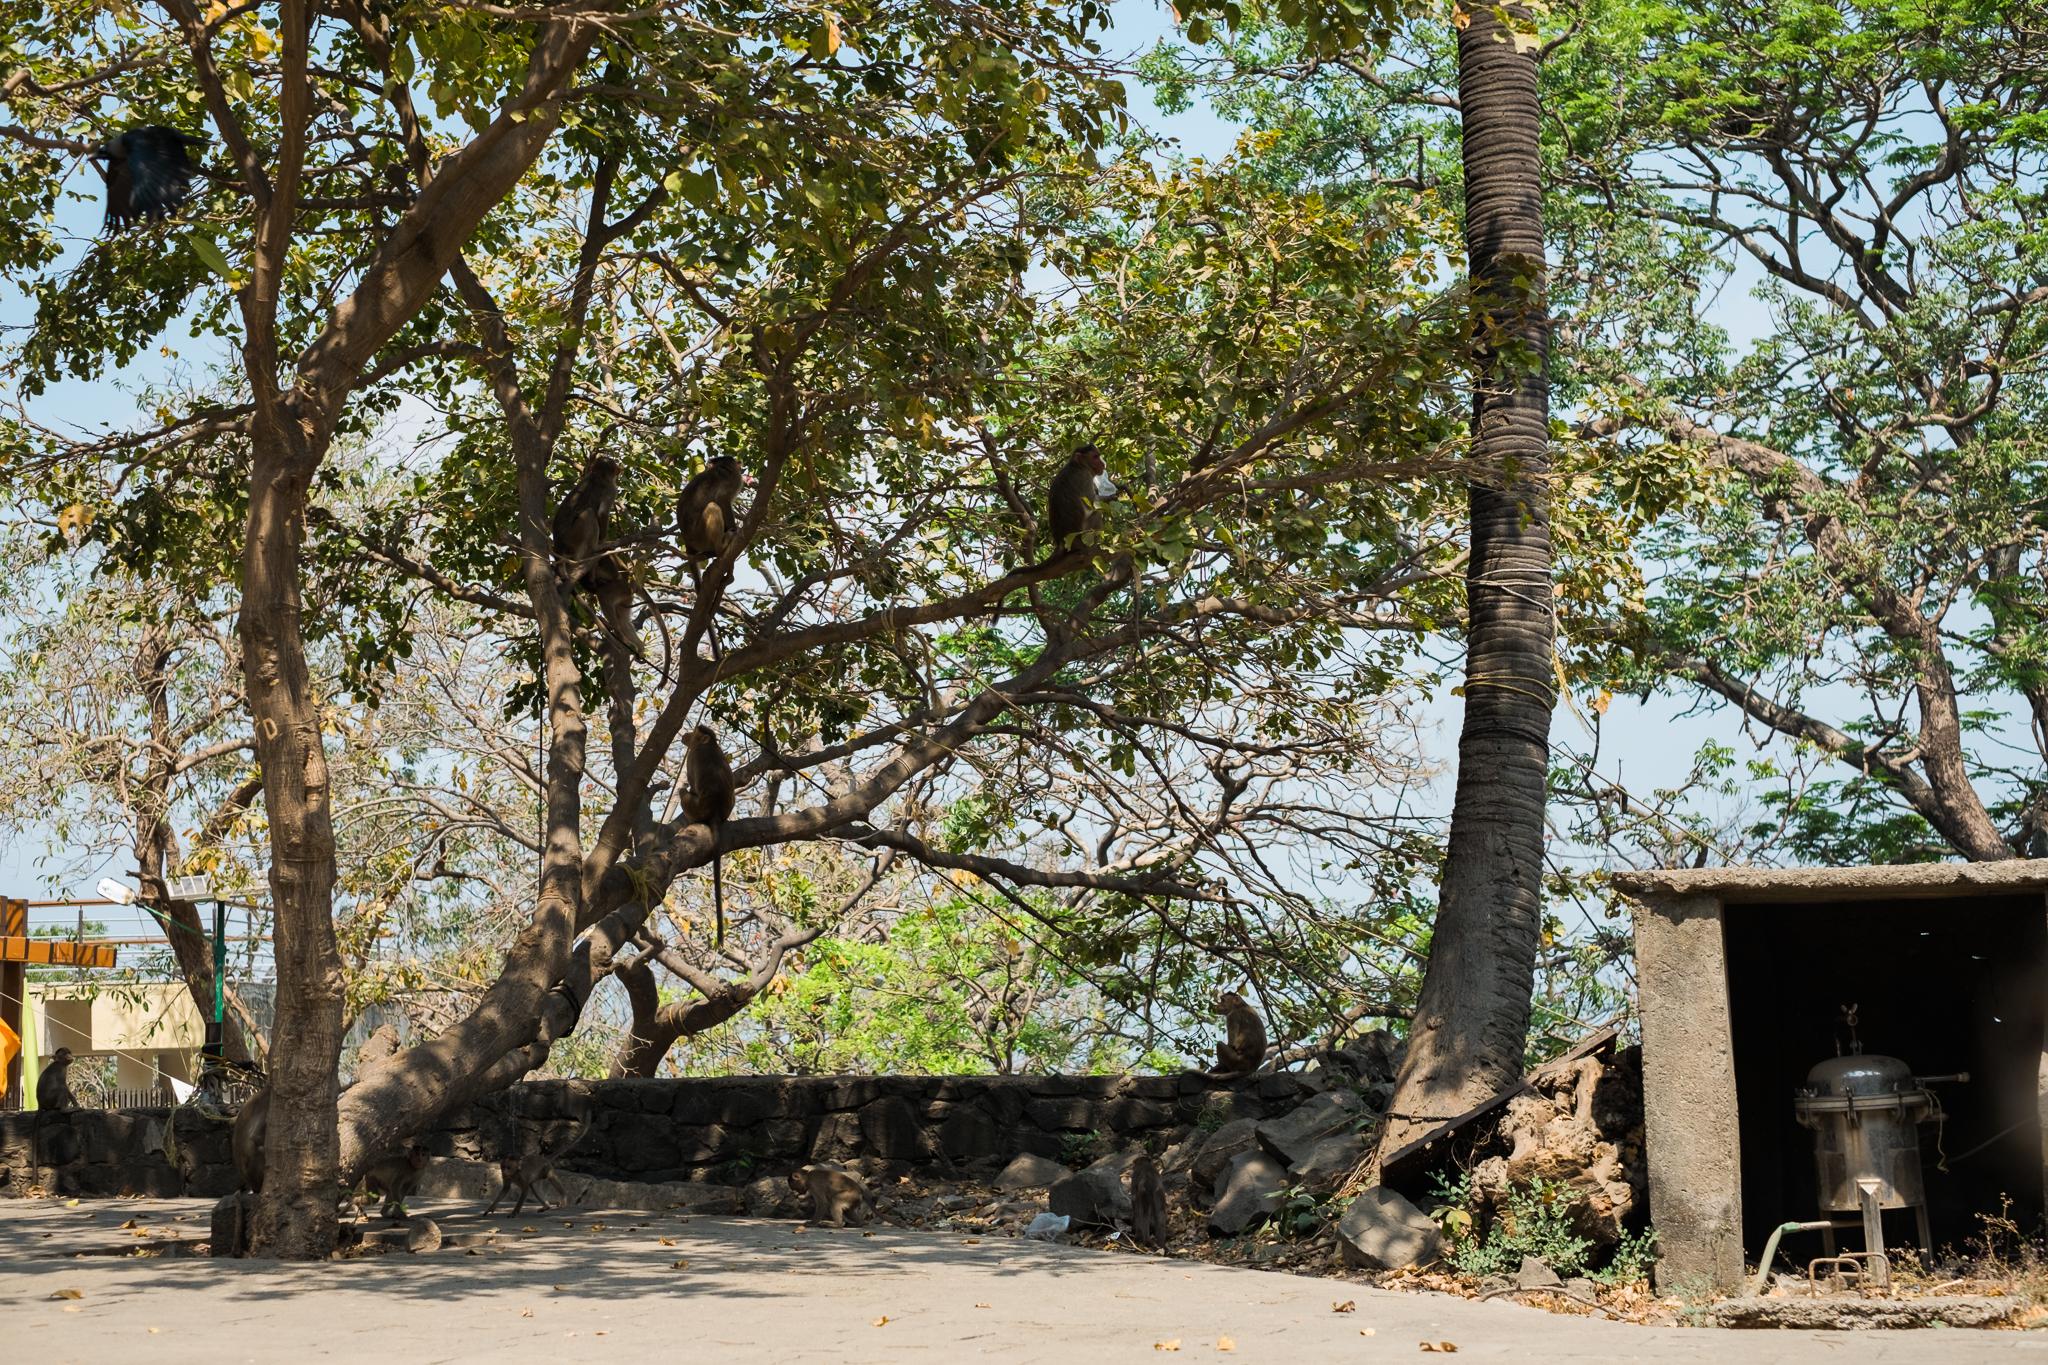 Mumbai India India Travel Street Photography (11 of 55).jpg